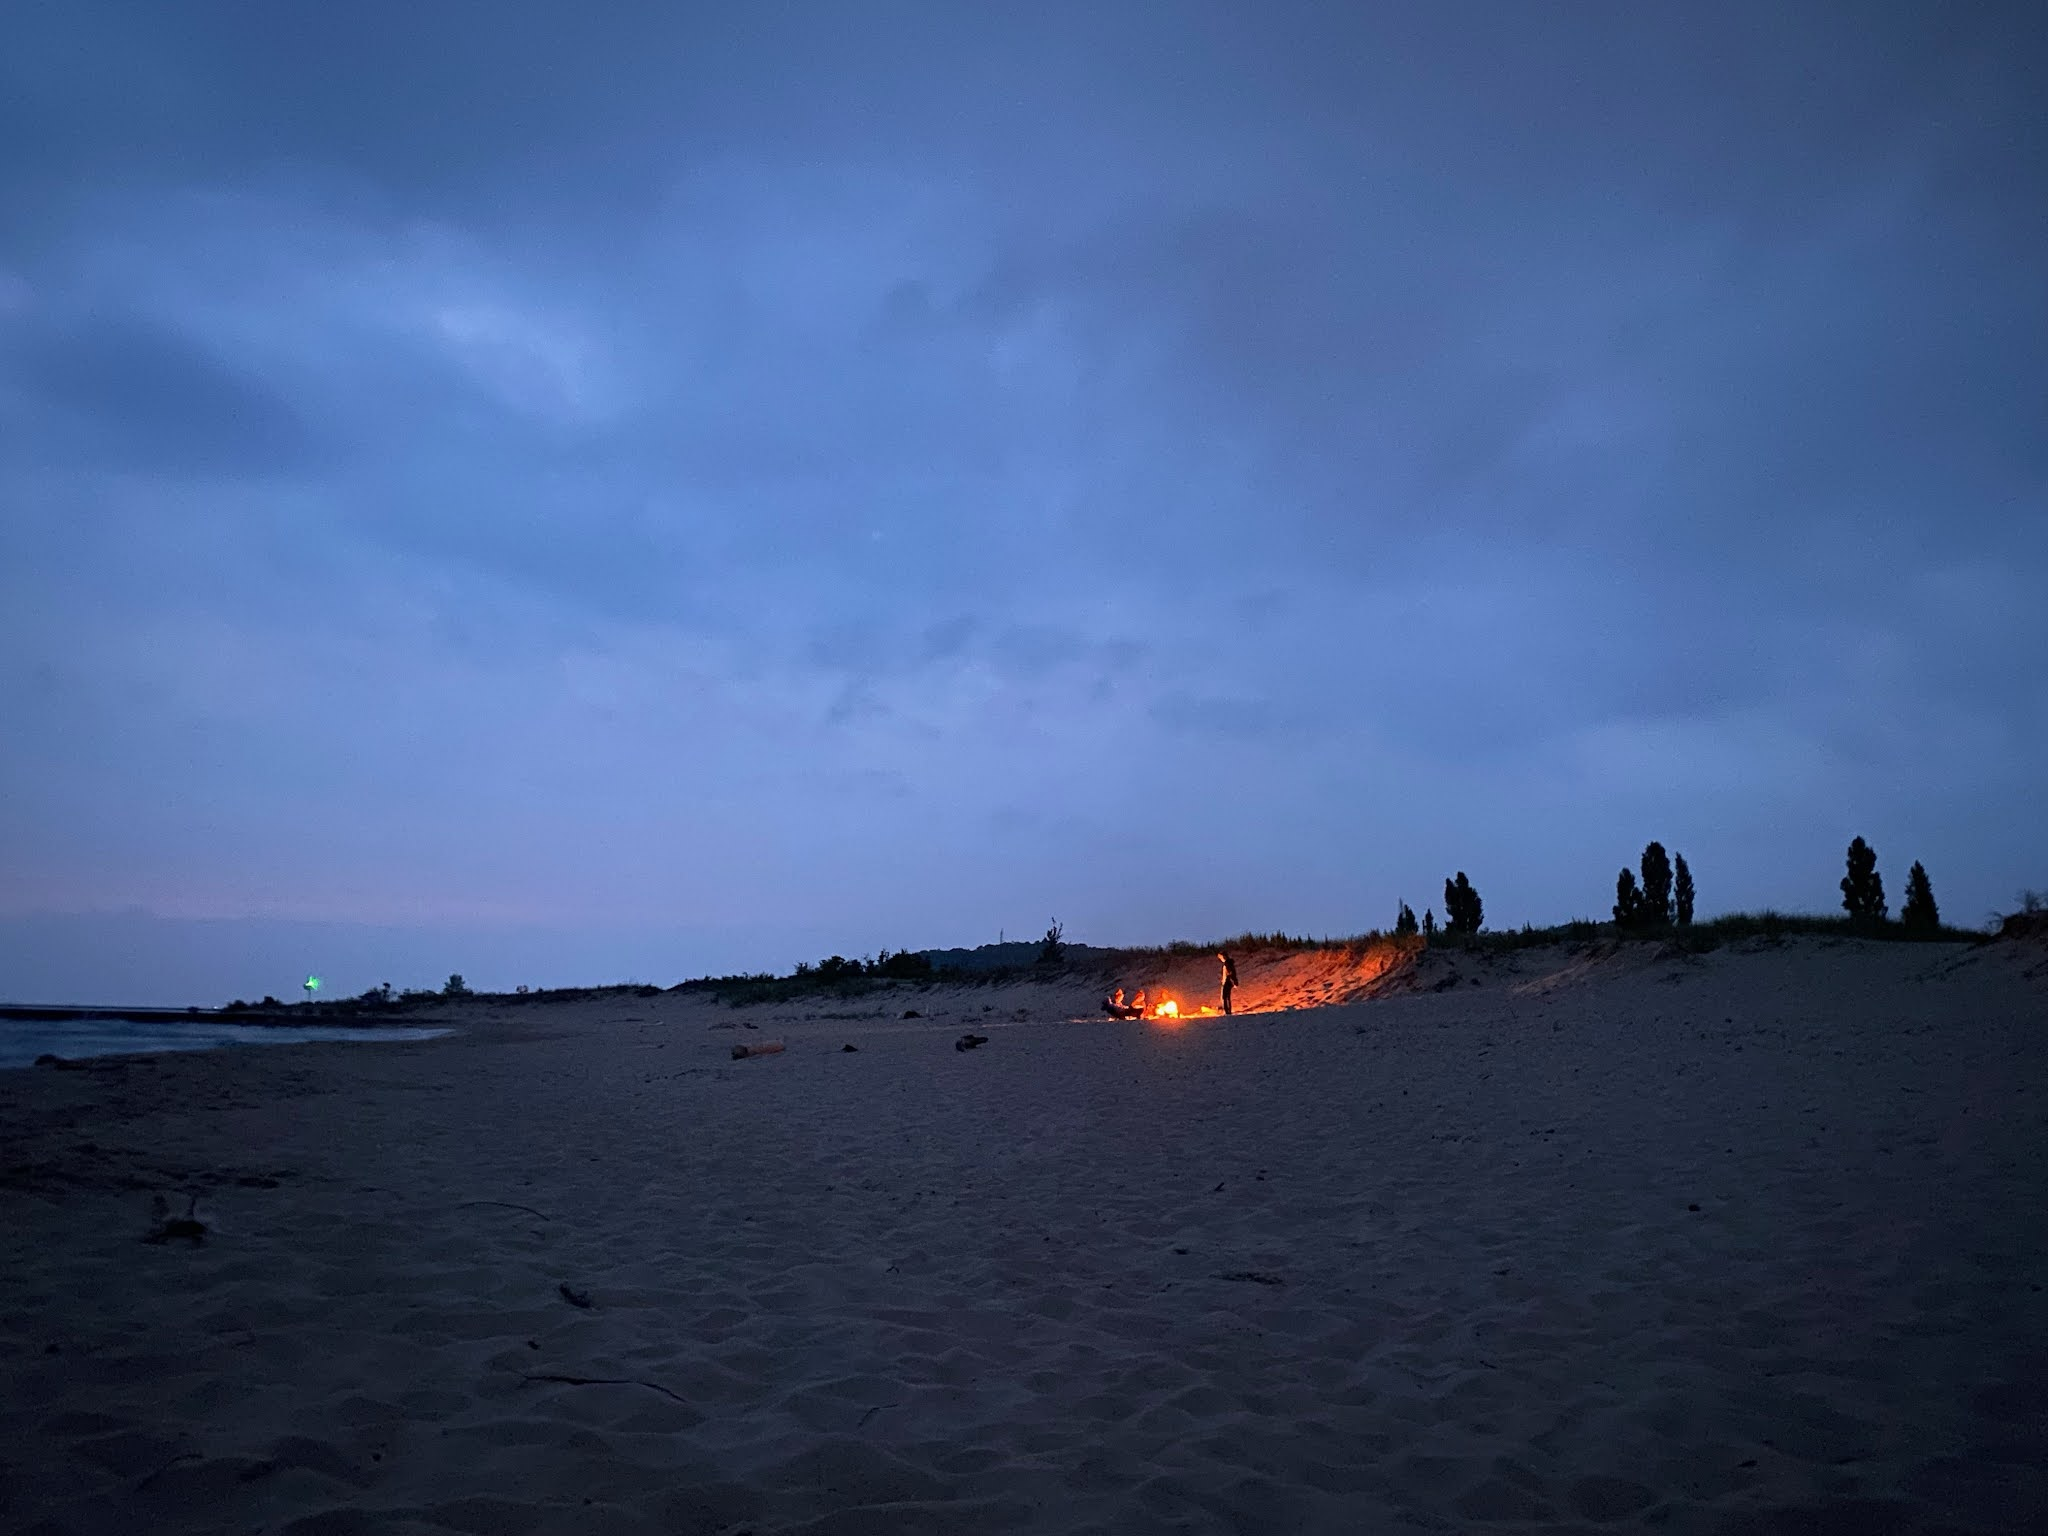 Summer Bonfire | www.biblio-style.com